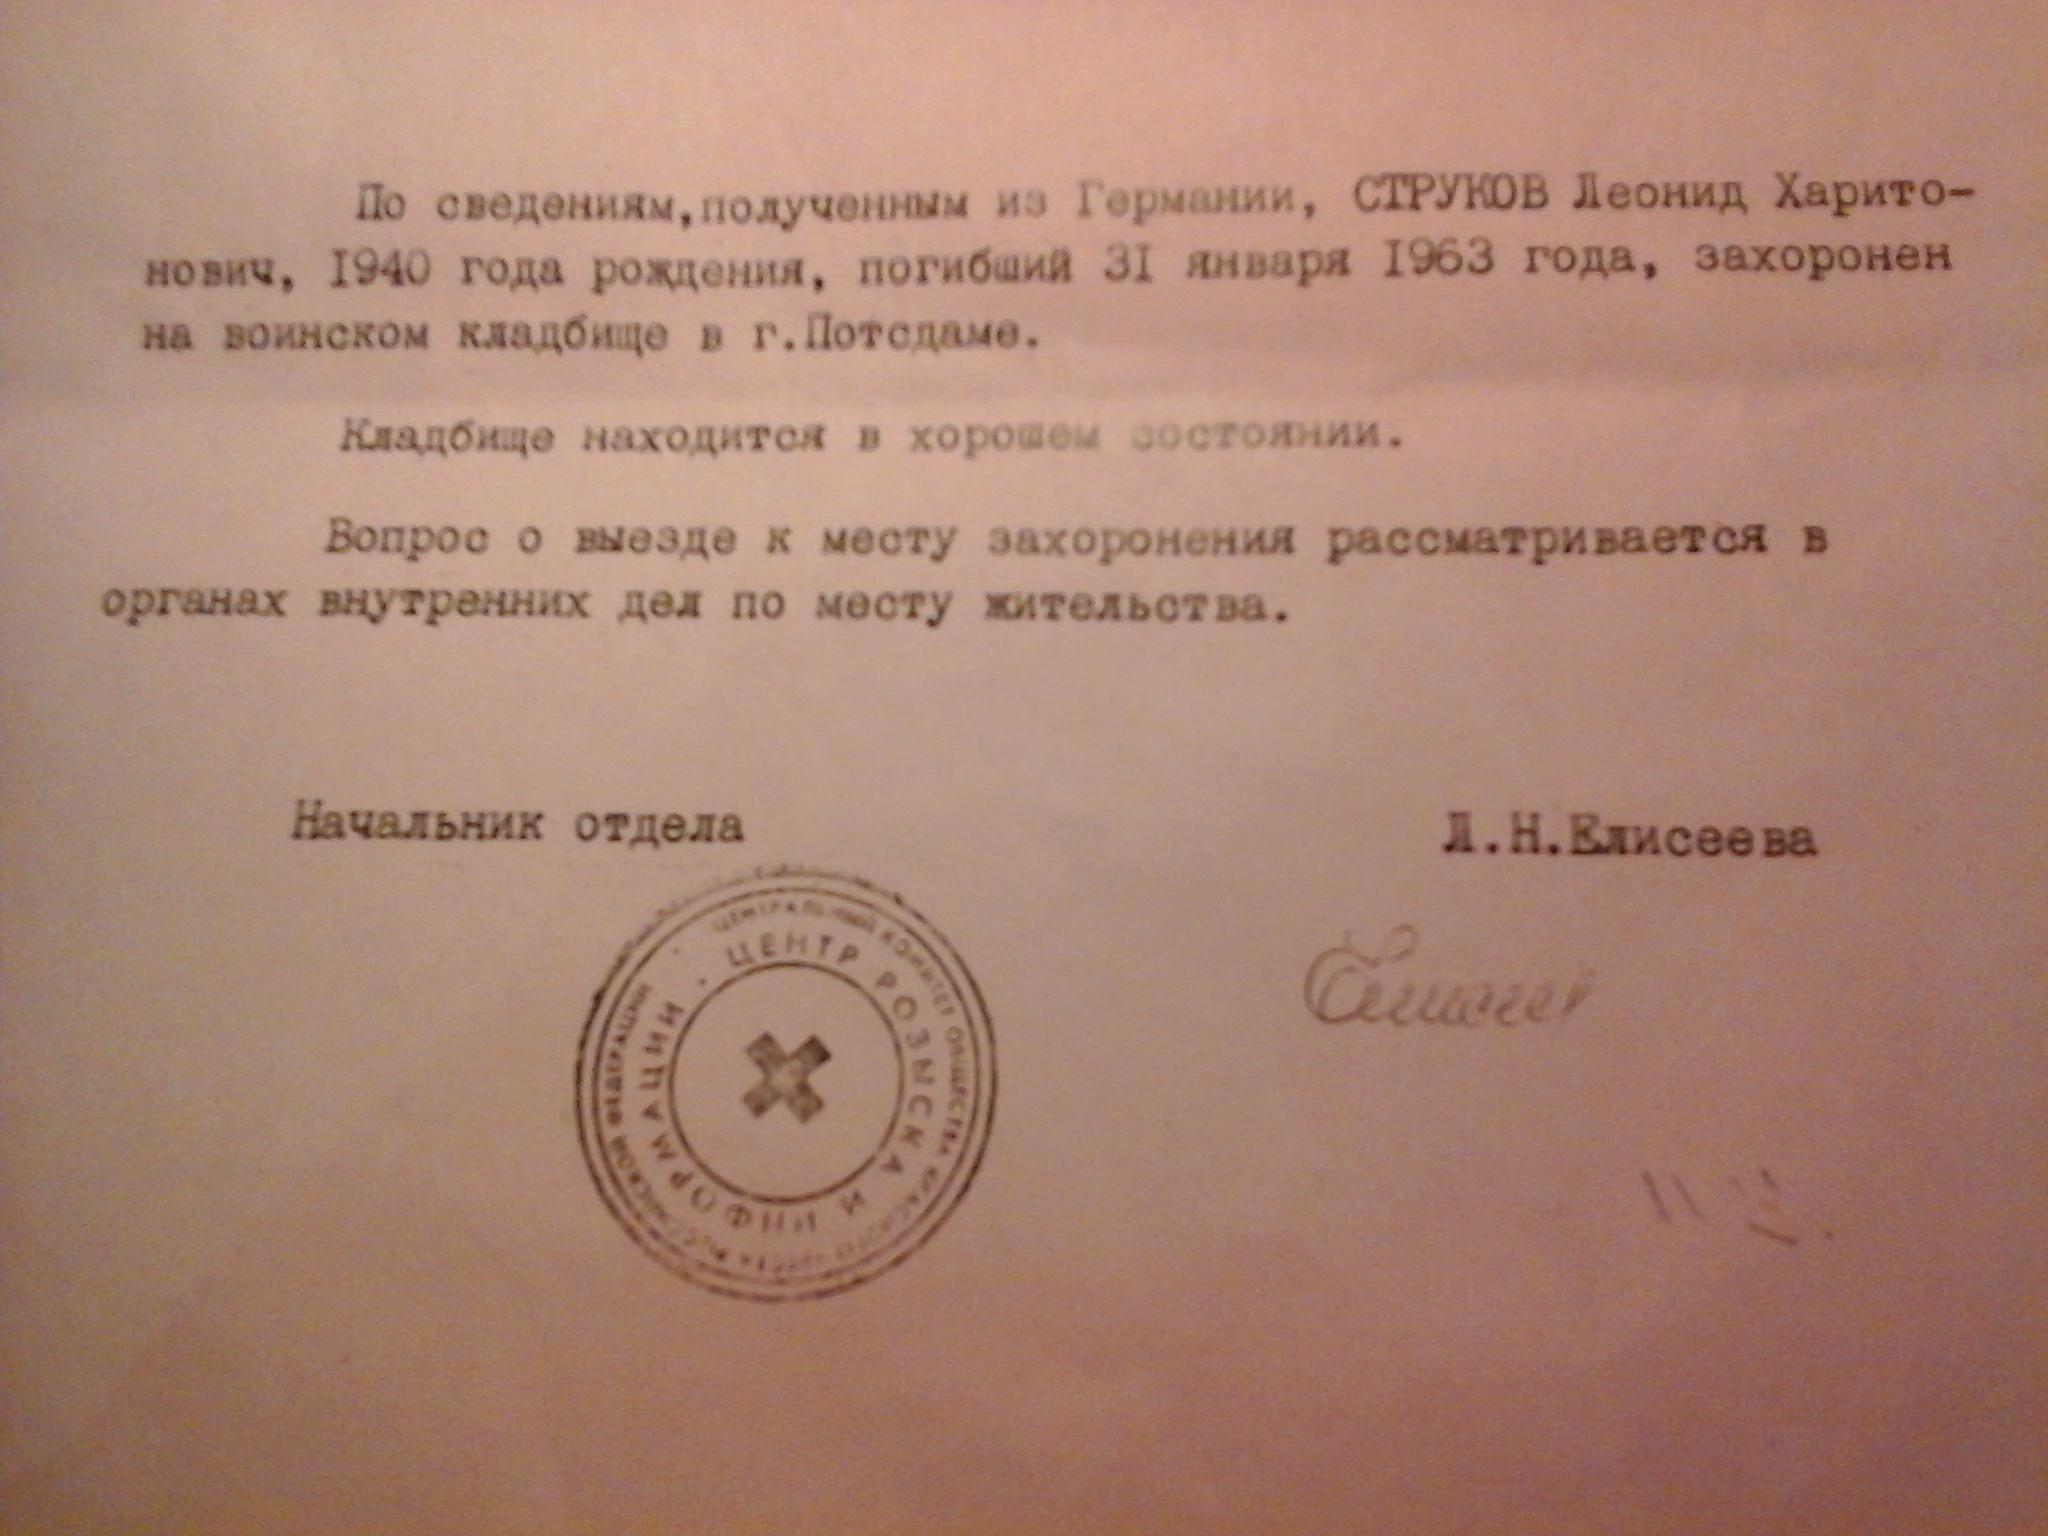 http://s3.uploads.ru/ng4lJ.jpg